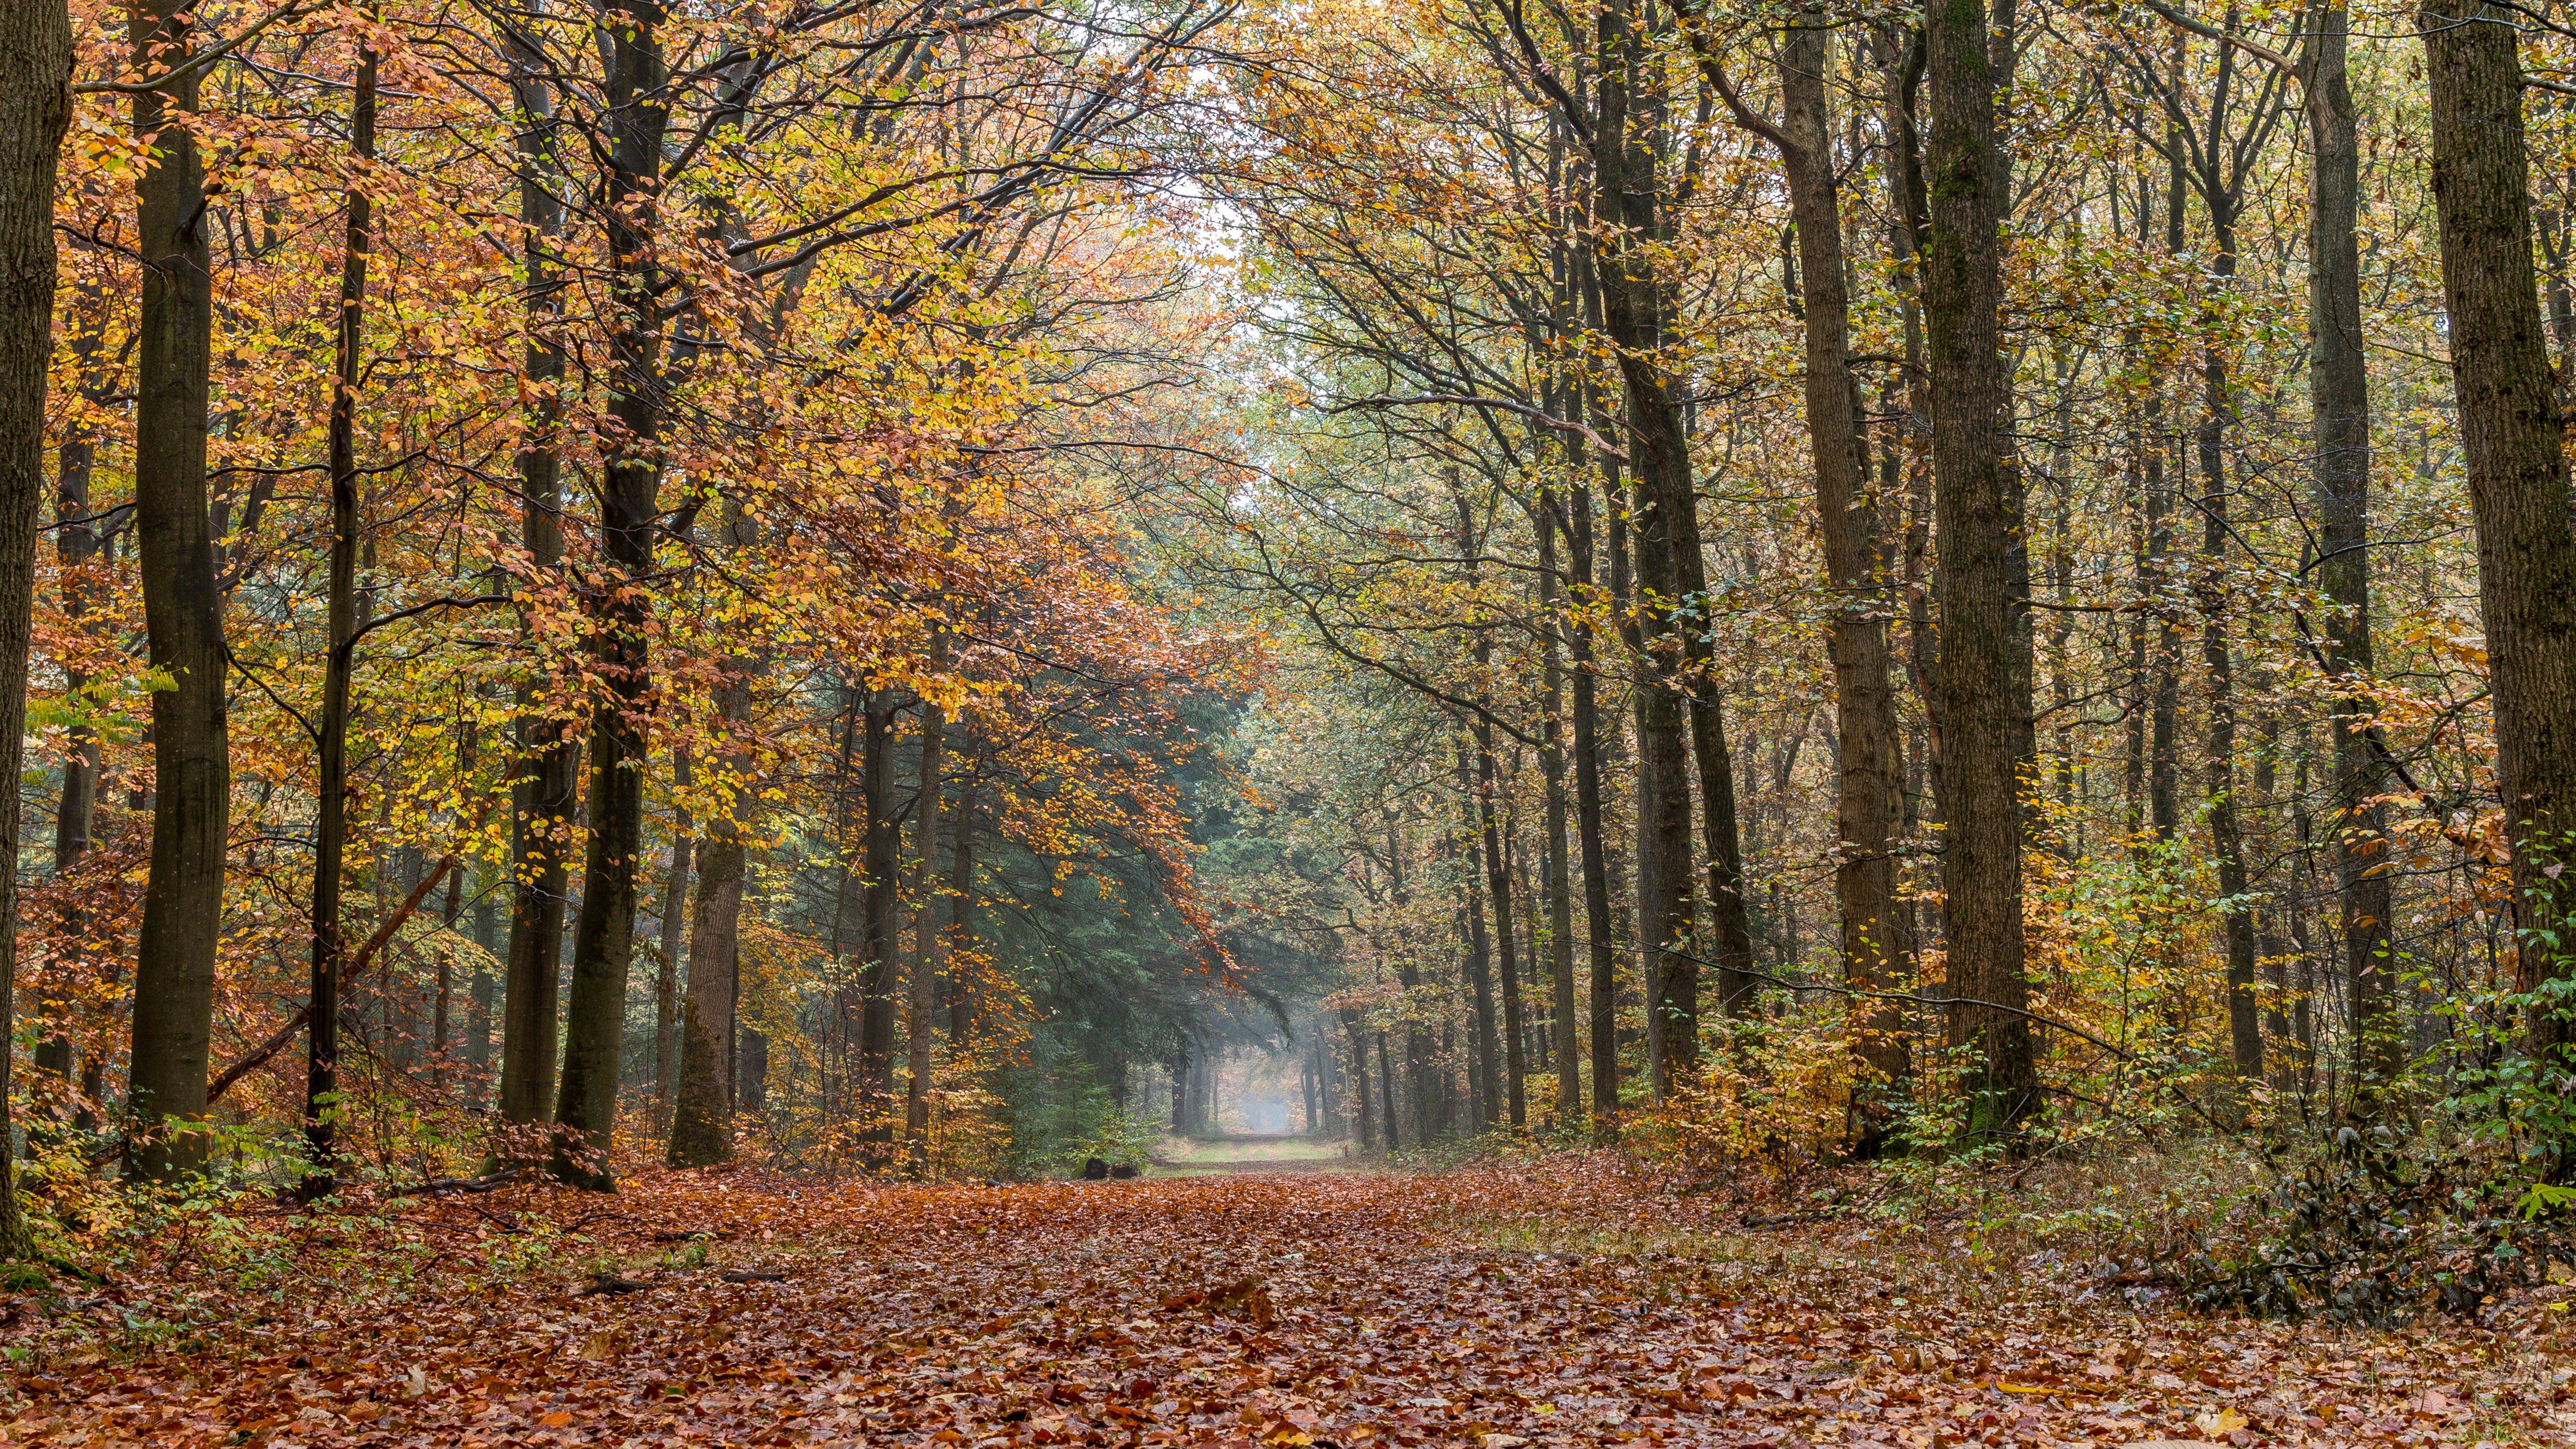 autumn, autumn leaves, branches